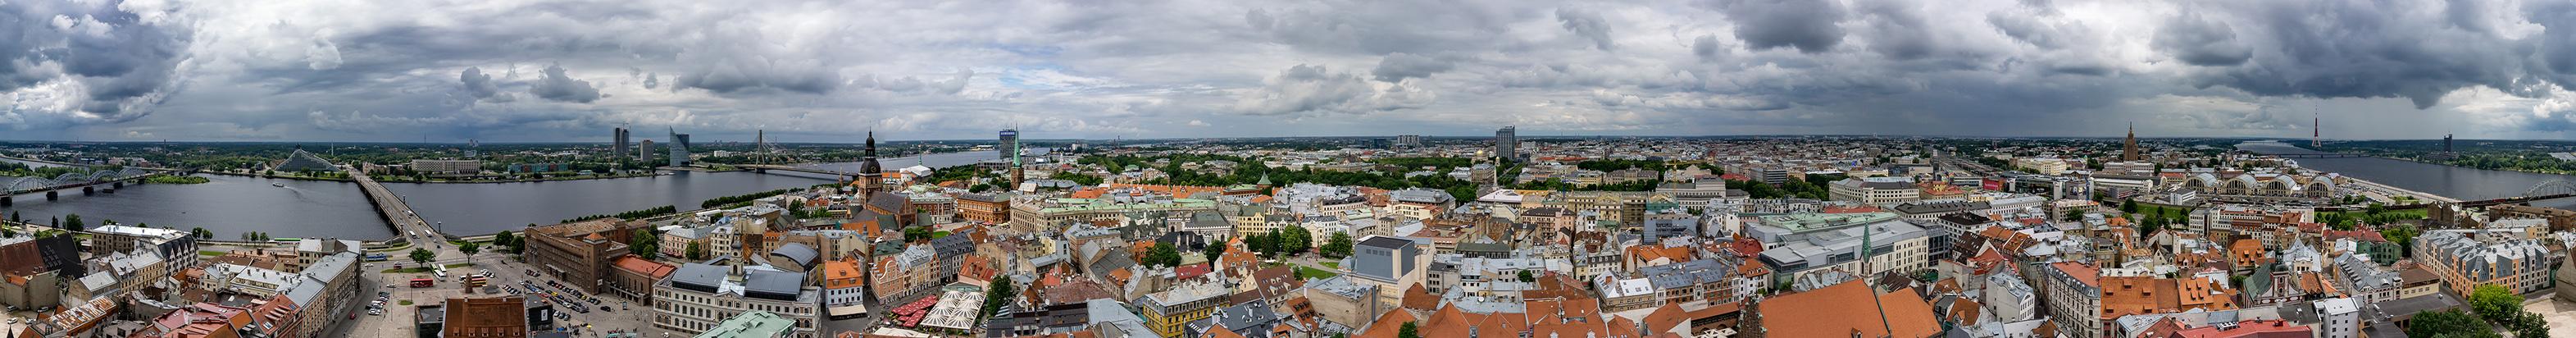 Rundumblick vom Turm der Petrikirche, Riga